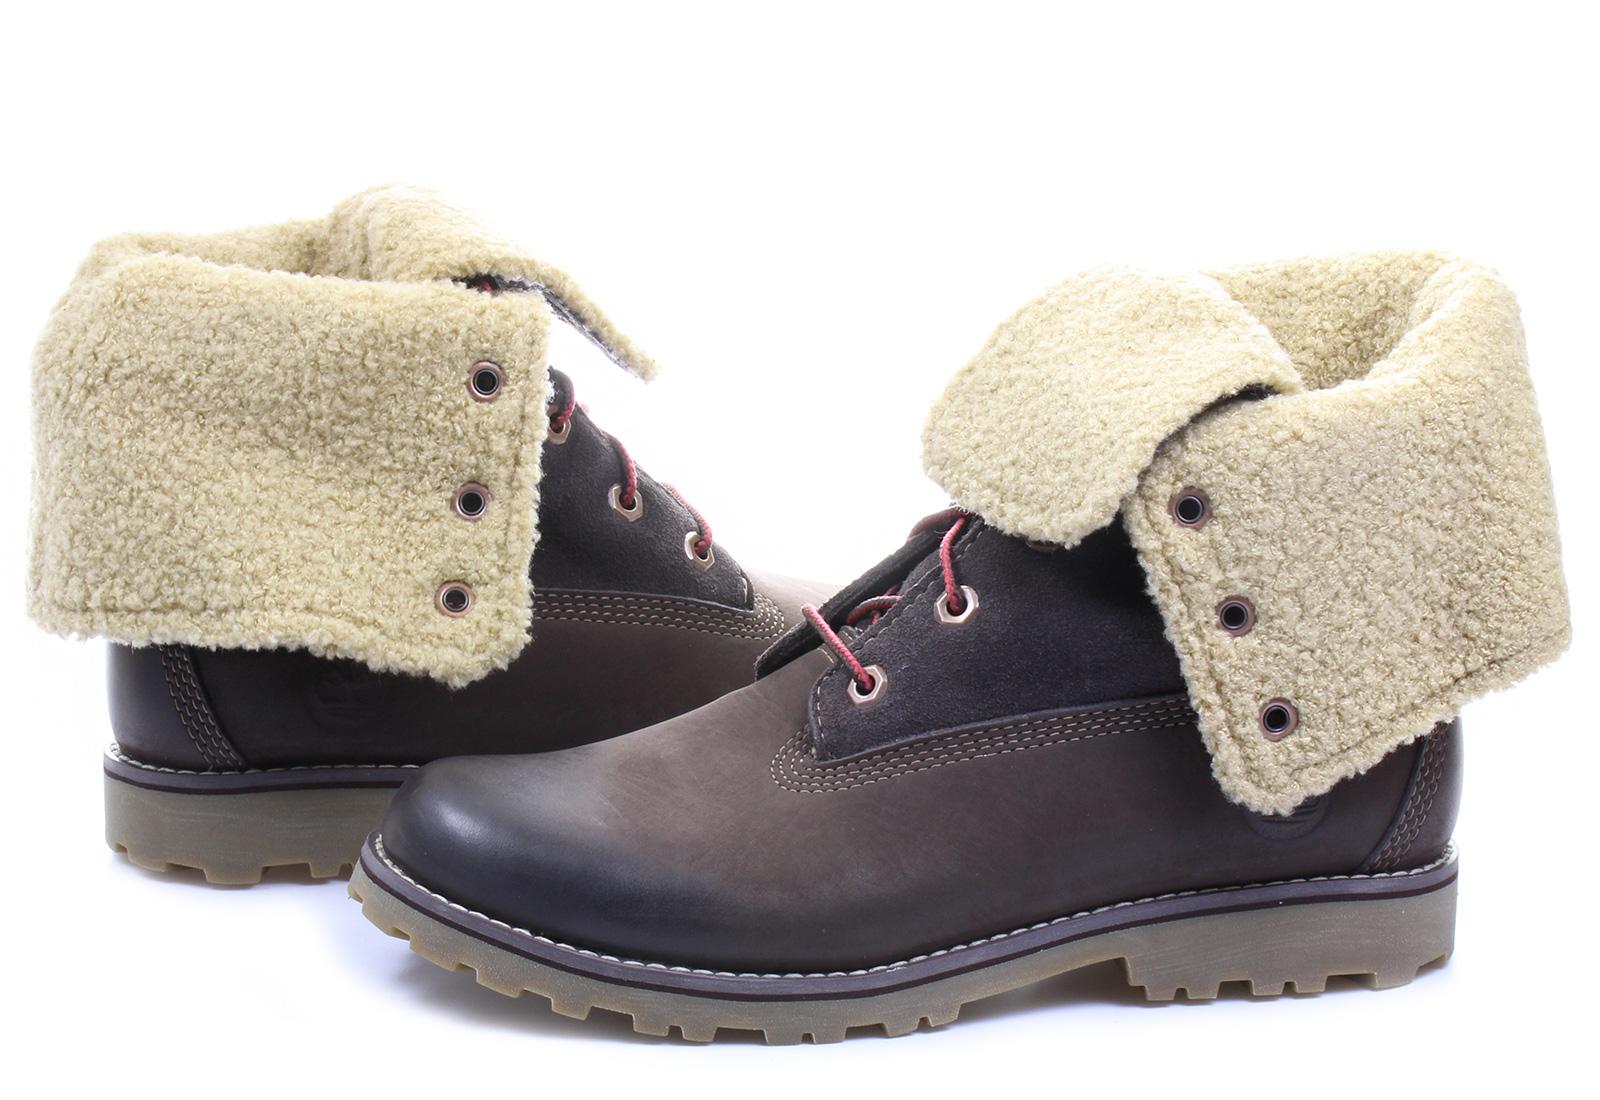 Skechers Csizma - Boot High - 46476-gry - Office Shoes Magyarország  Timberland Bakancs - 6 Inch Shearling Boot - 6298R-DBR - Office Shoes  Magyarország de557d3d2c